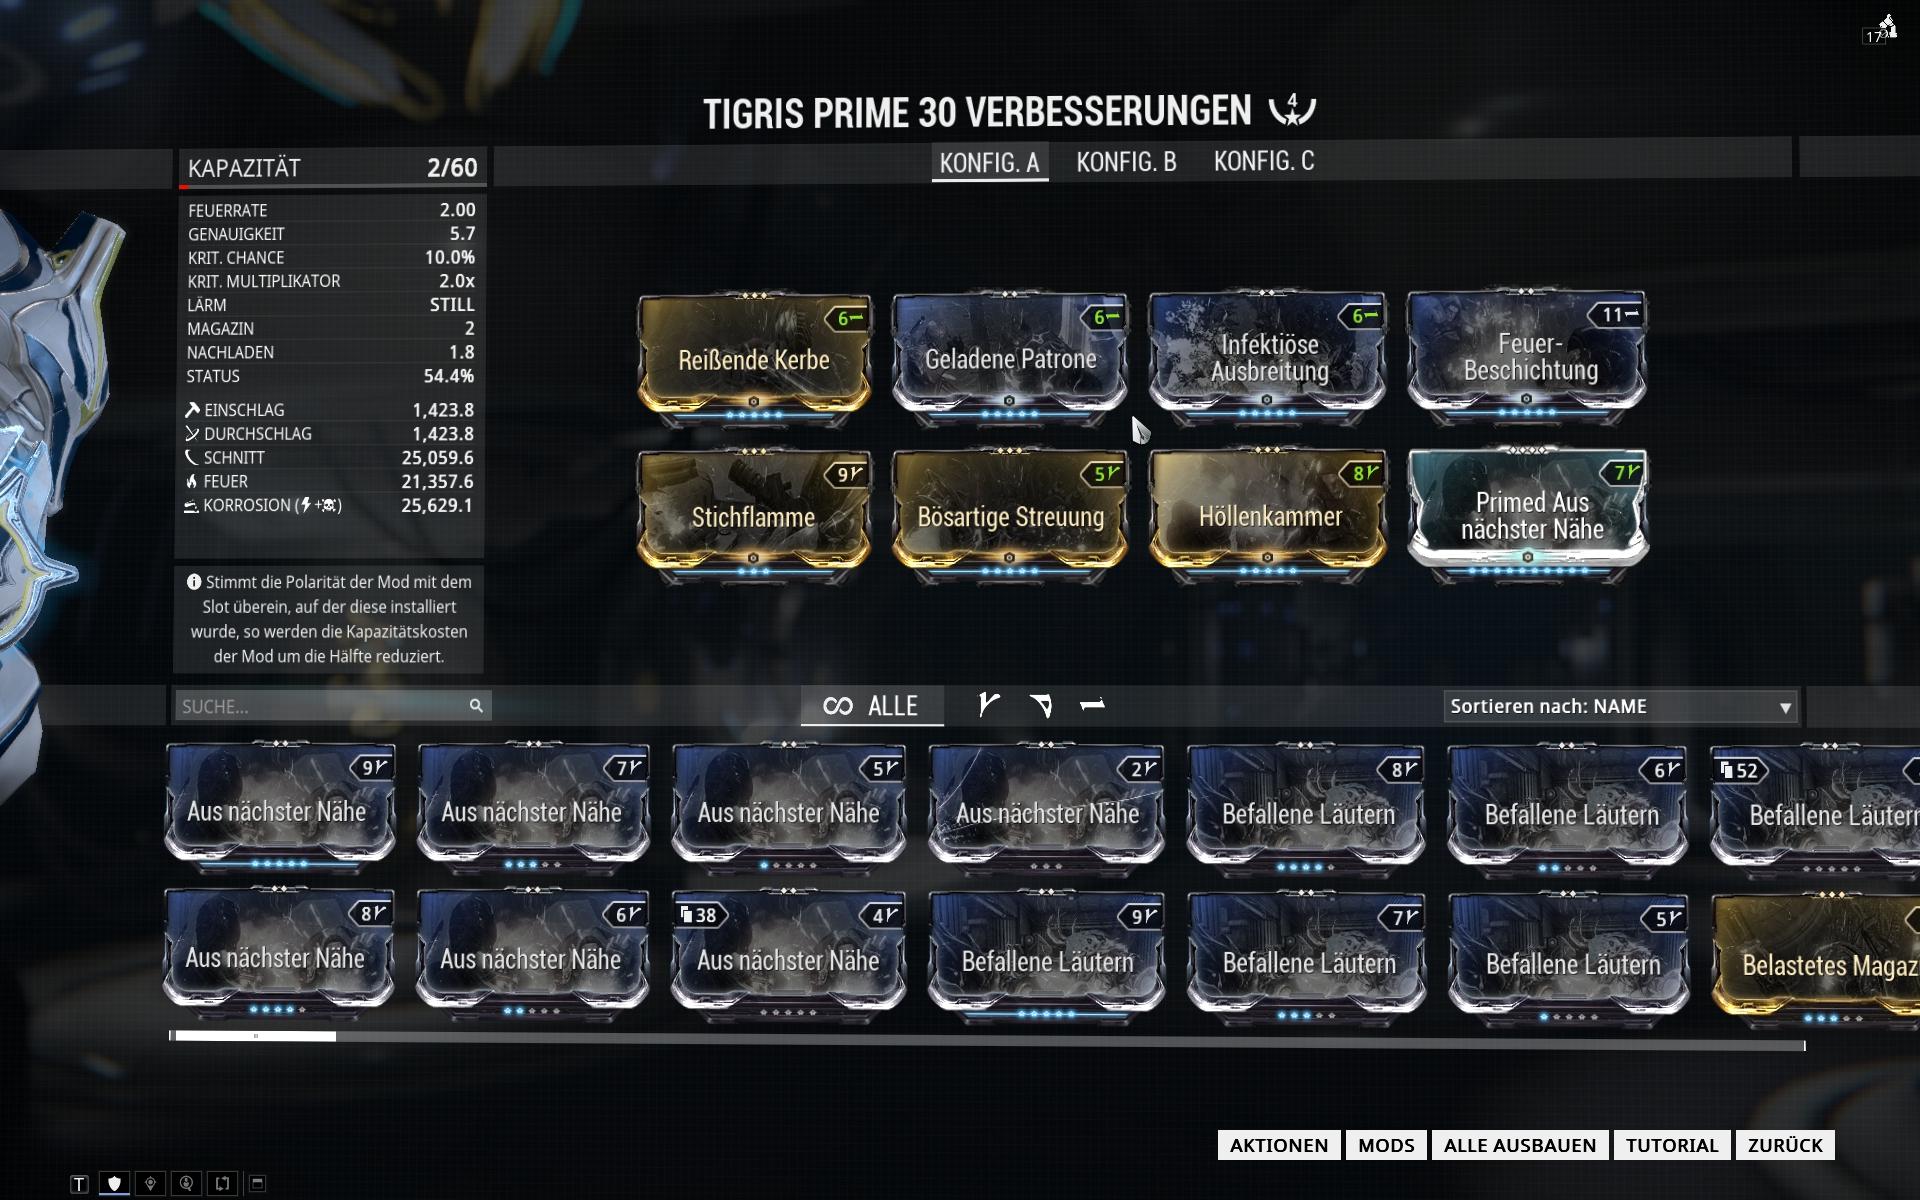 warframe how to get tigris prime